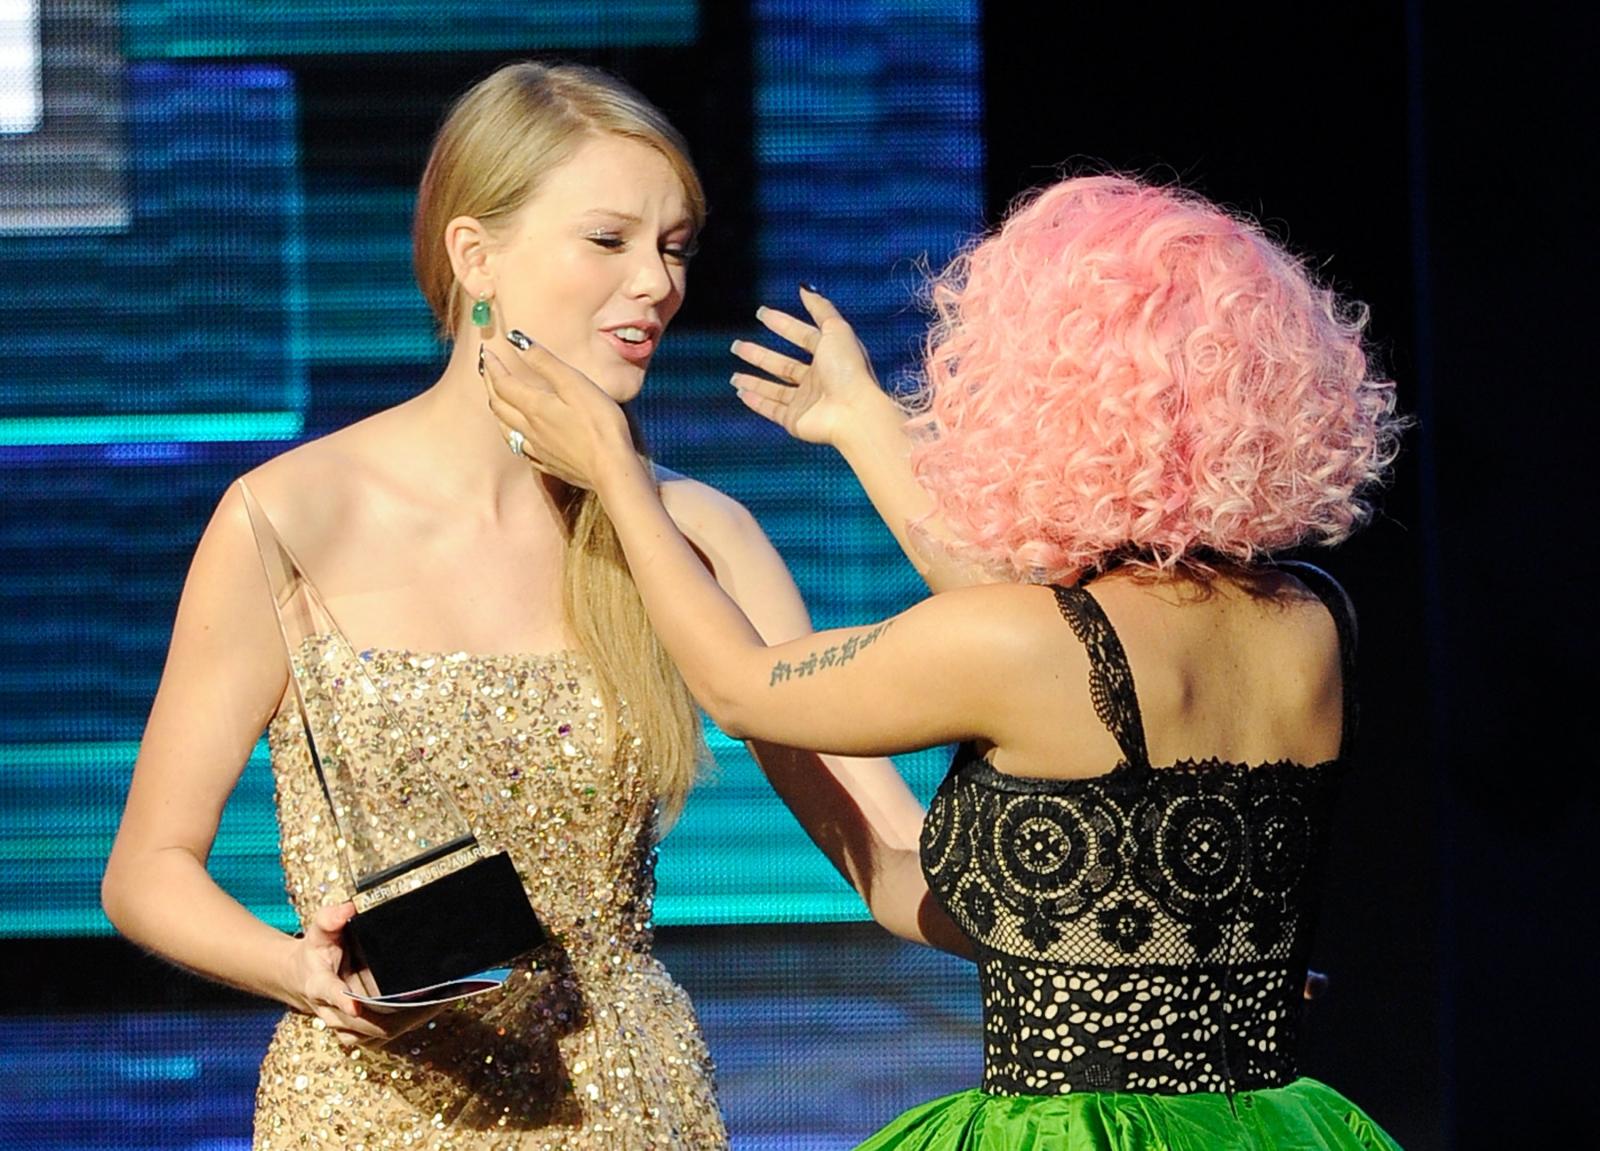 Taylor Swift and Nicki Minaj